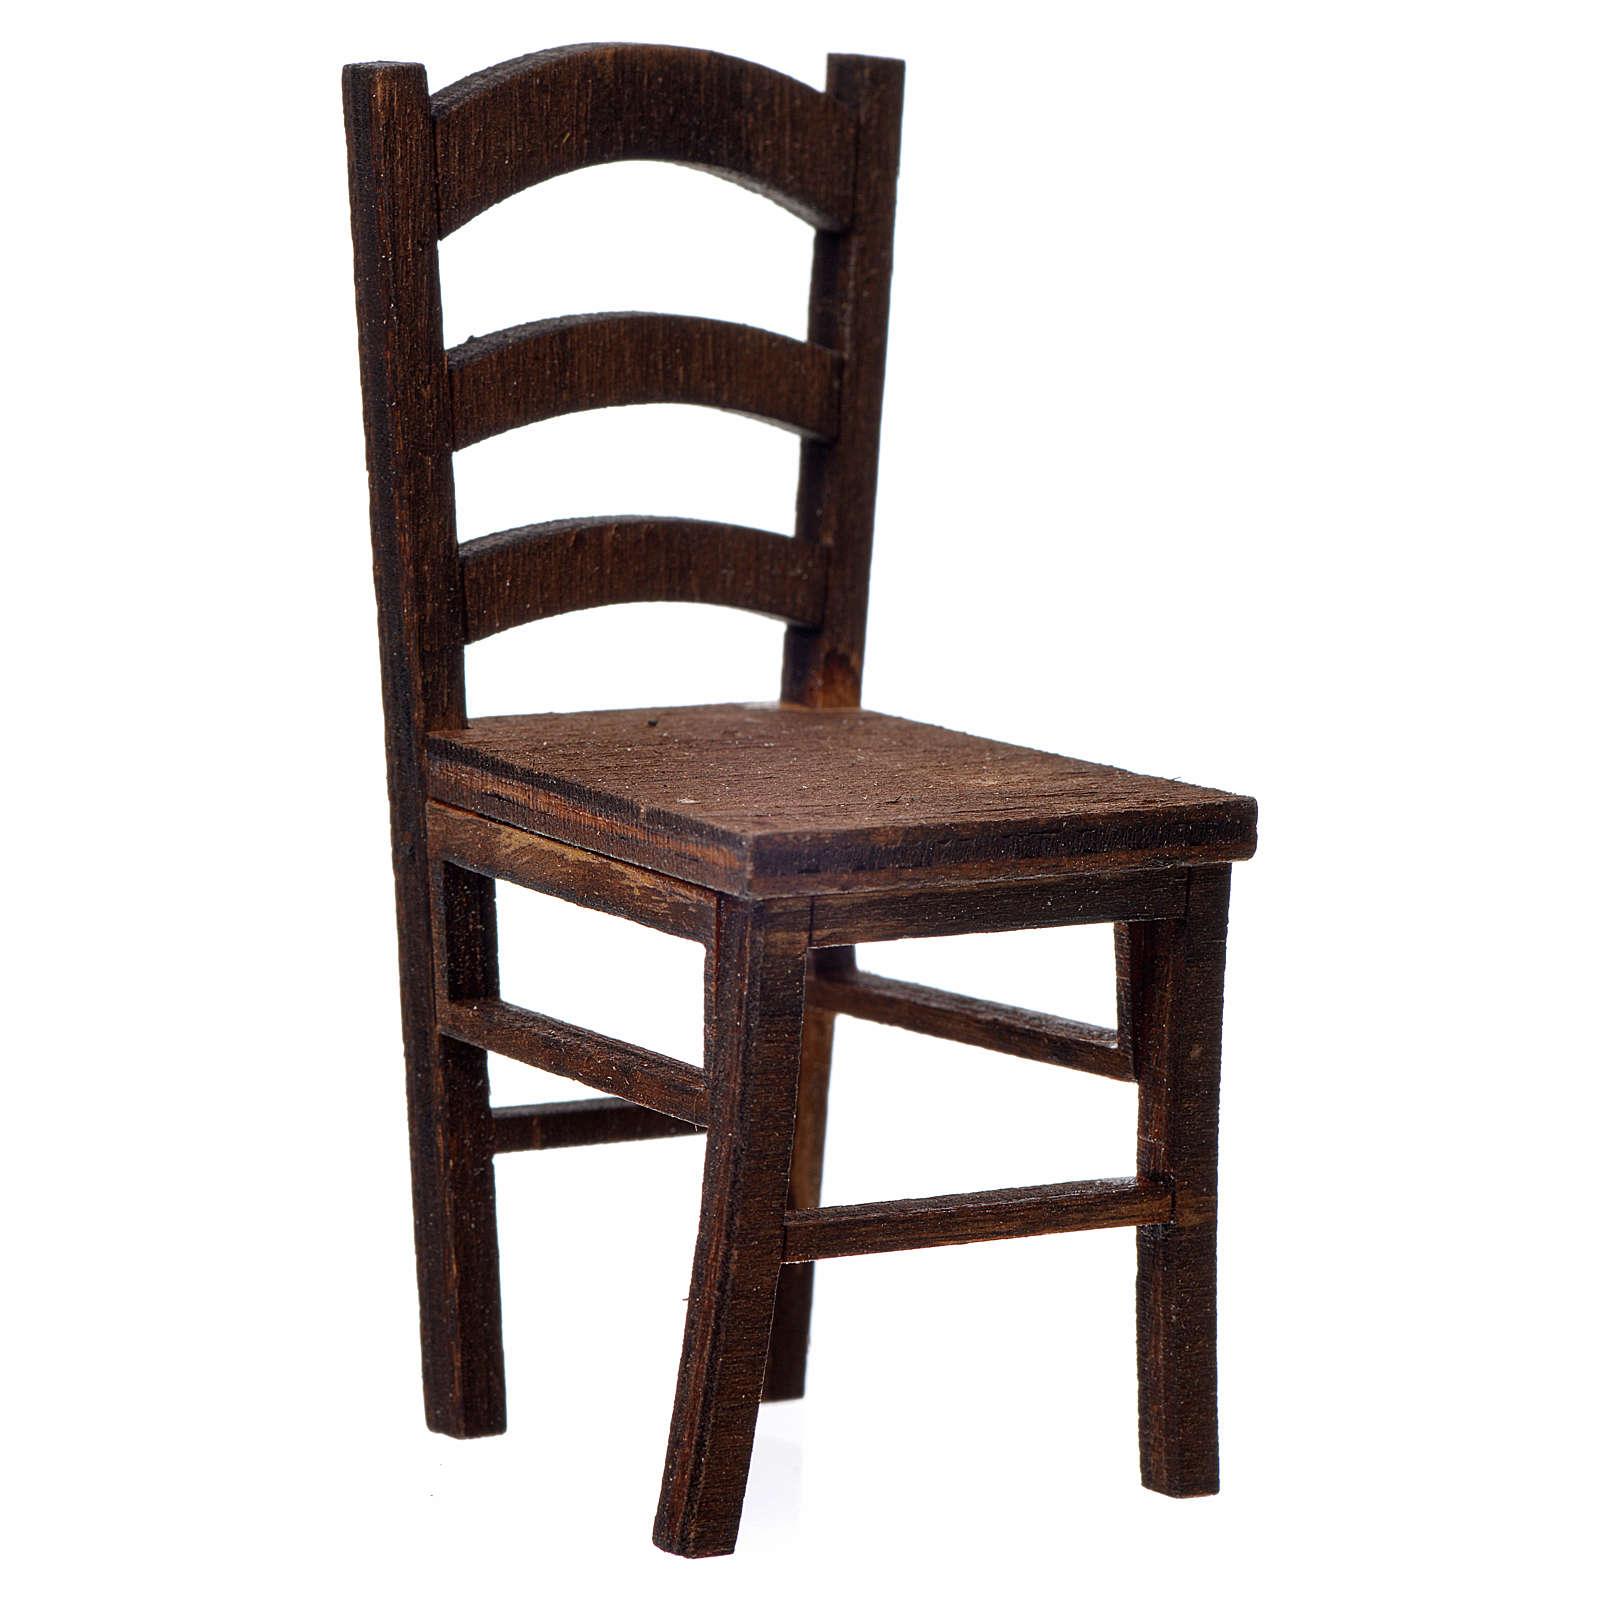 Sedia legno presepe 6,5x3x3 4